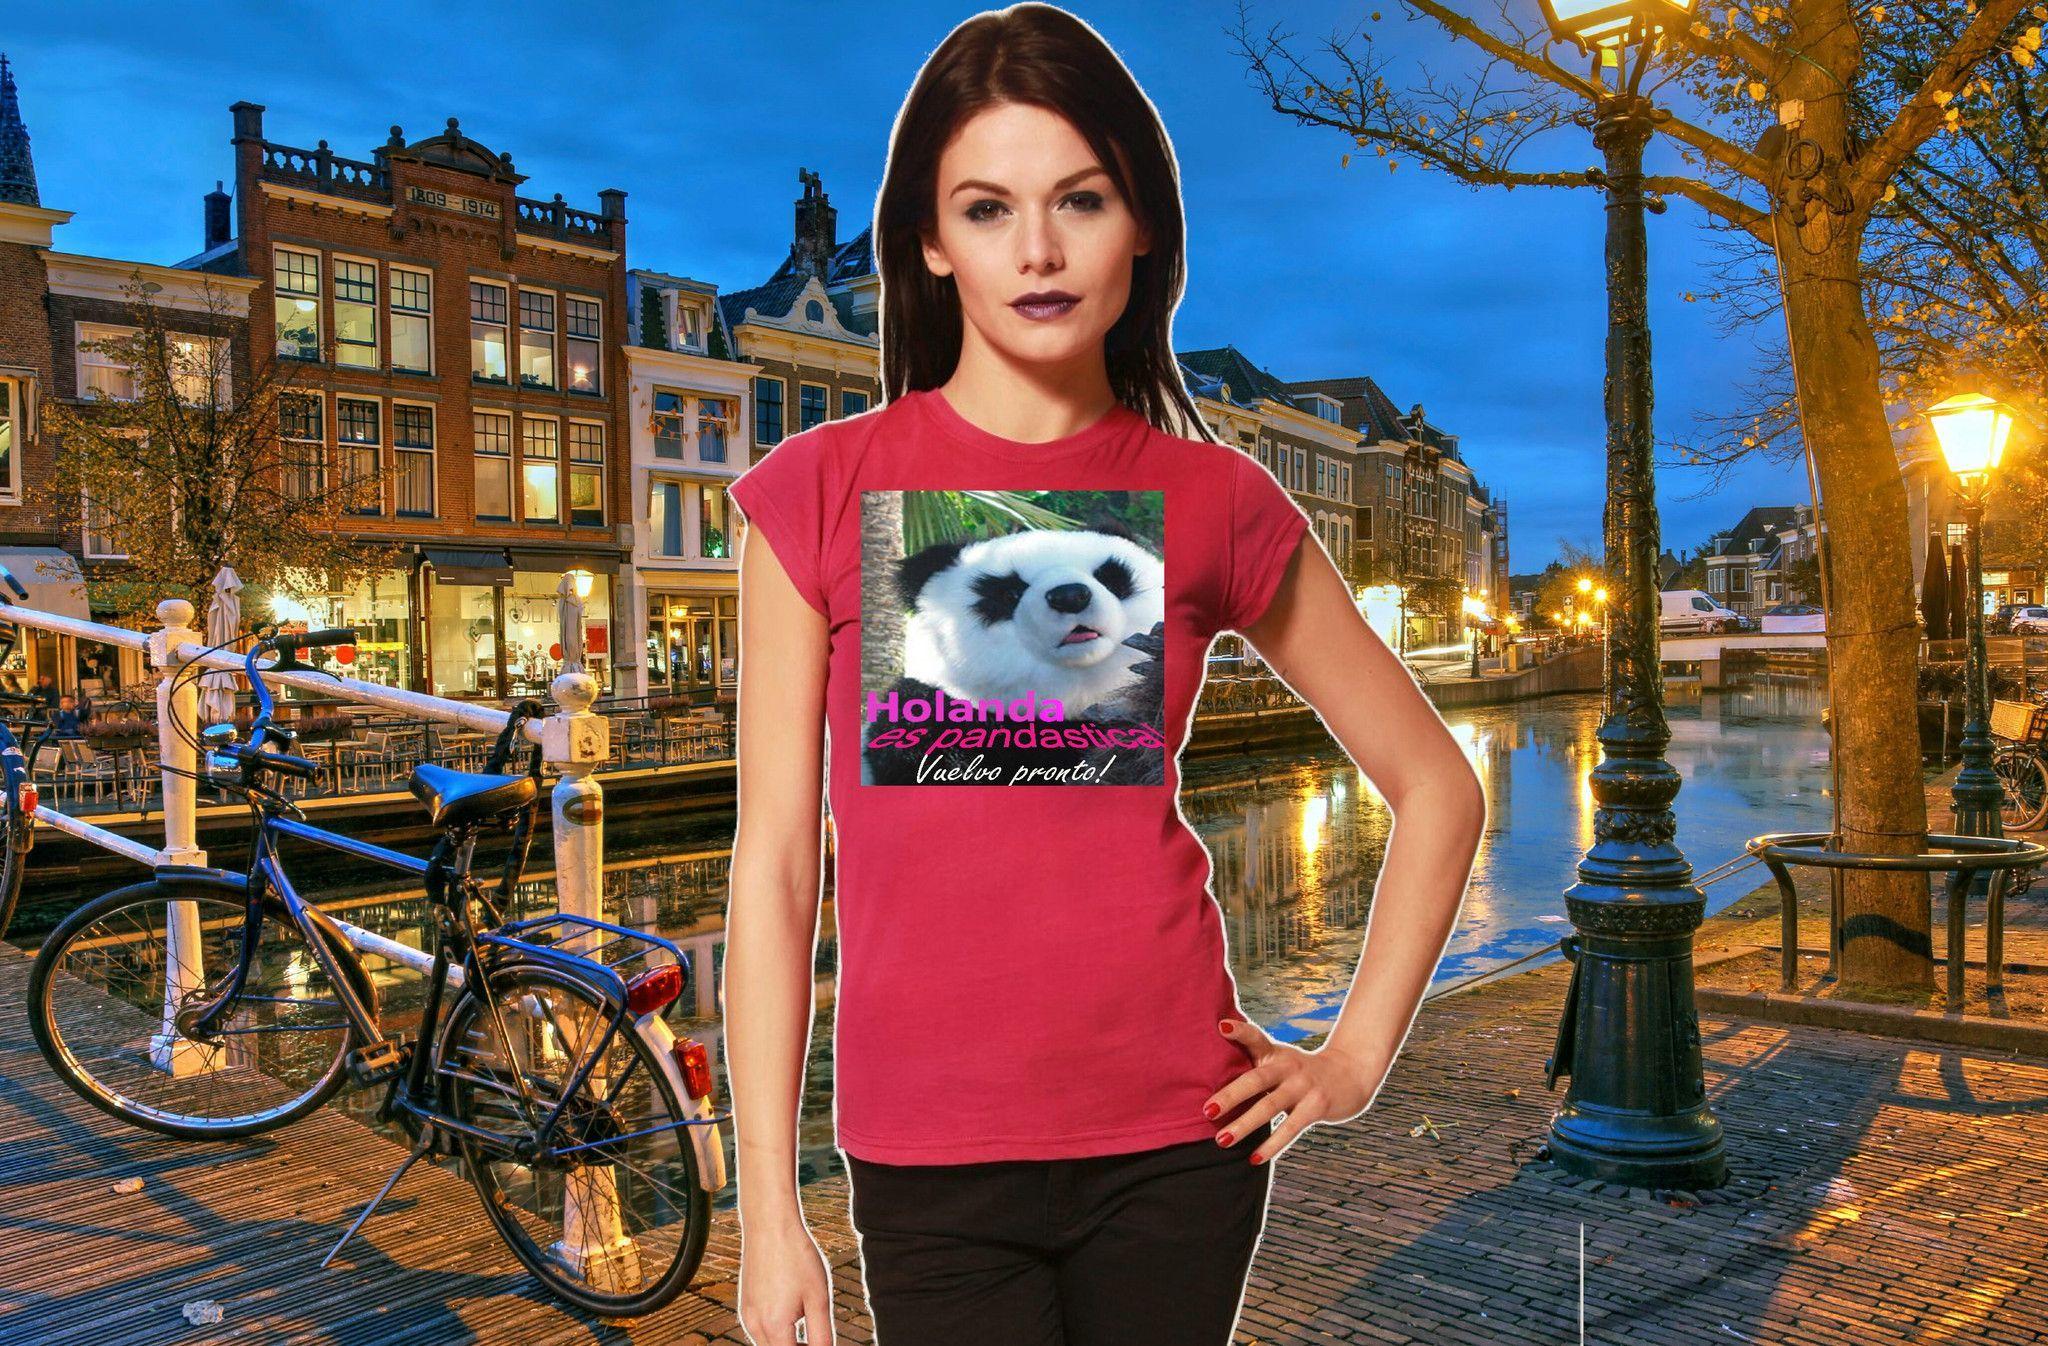 HOLANDA es pandastica! - Vuelvo pronto!